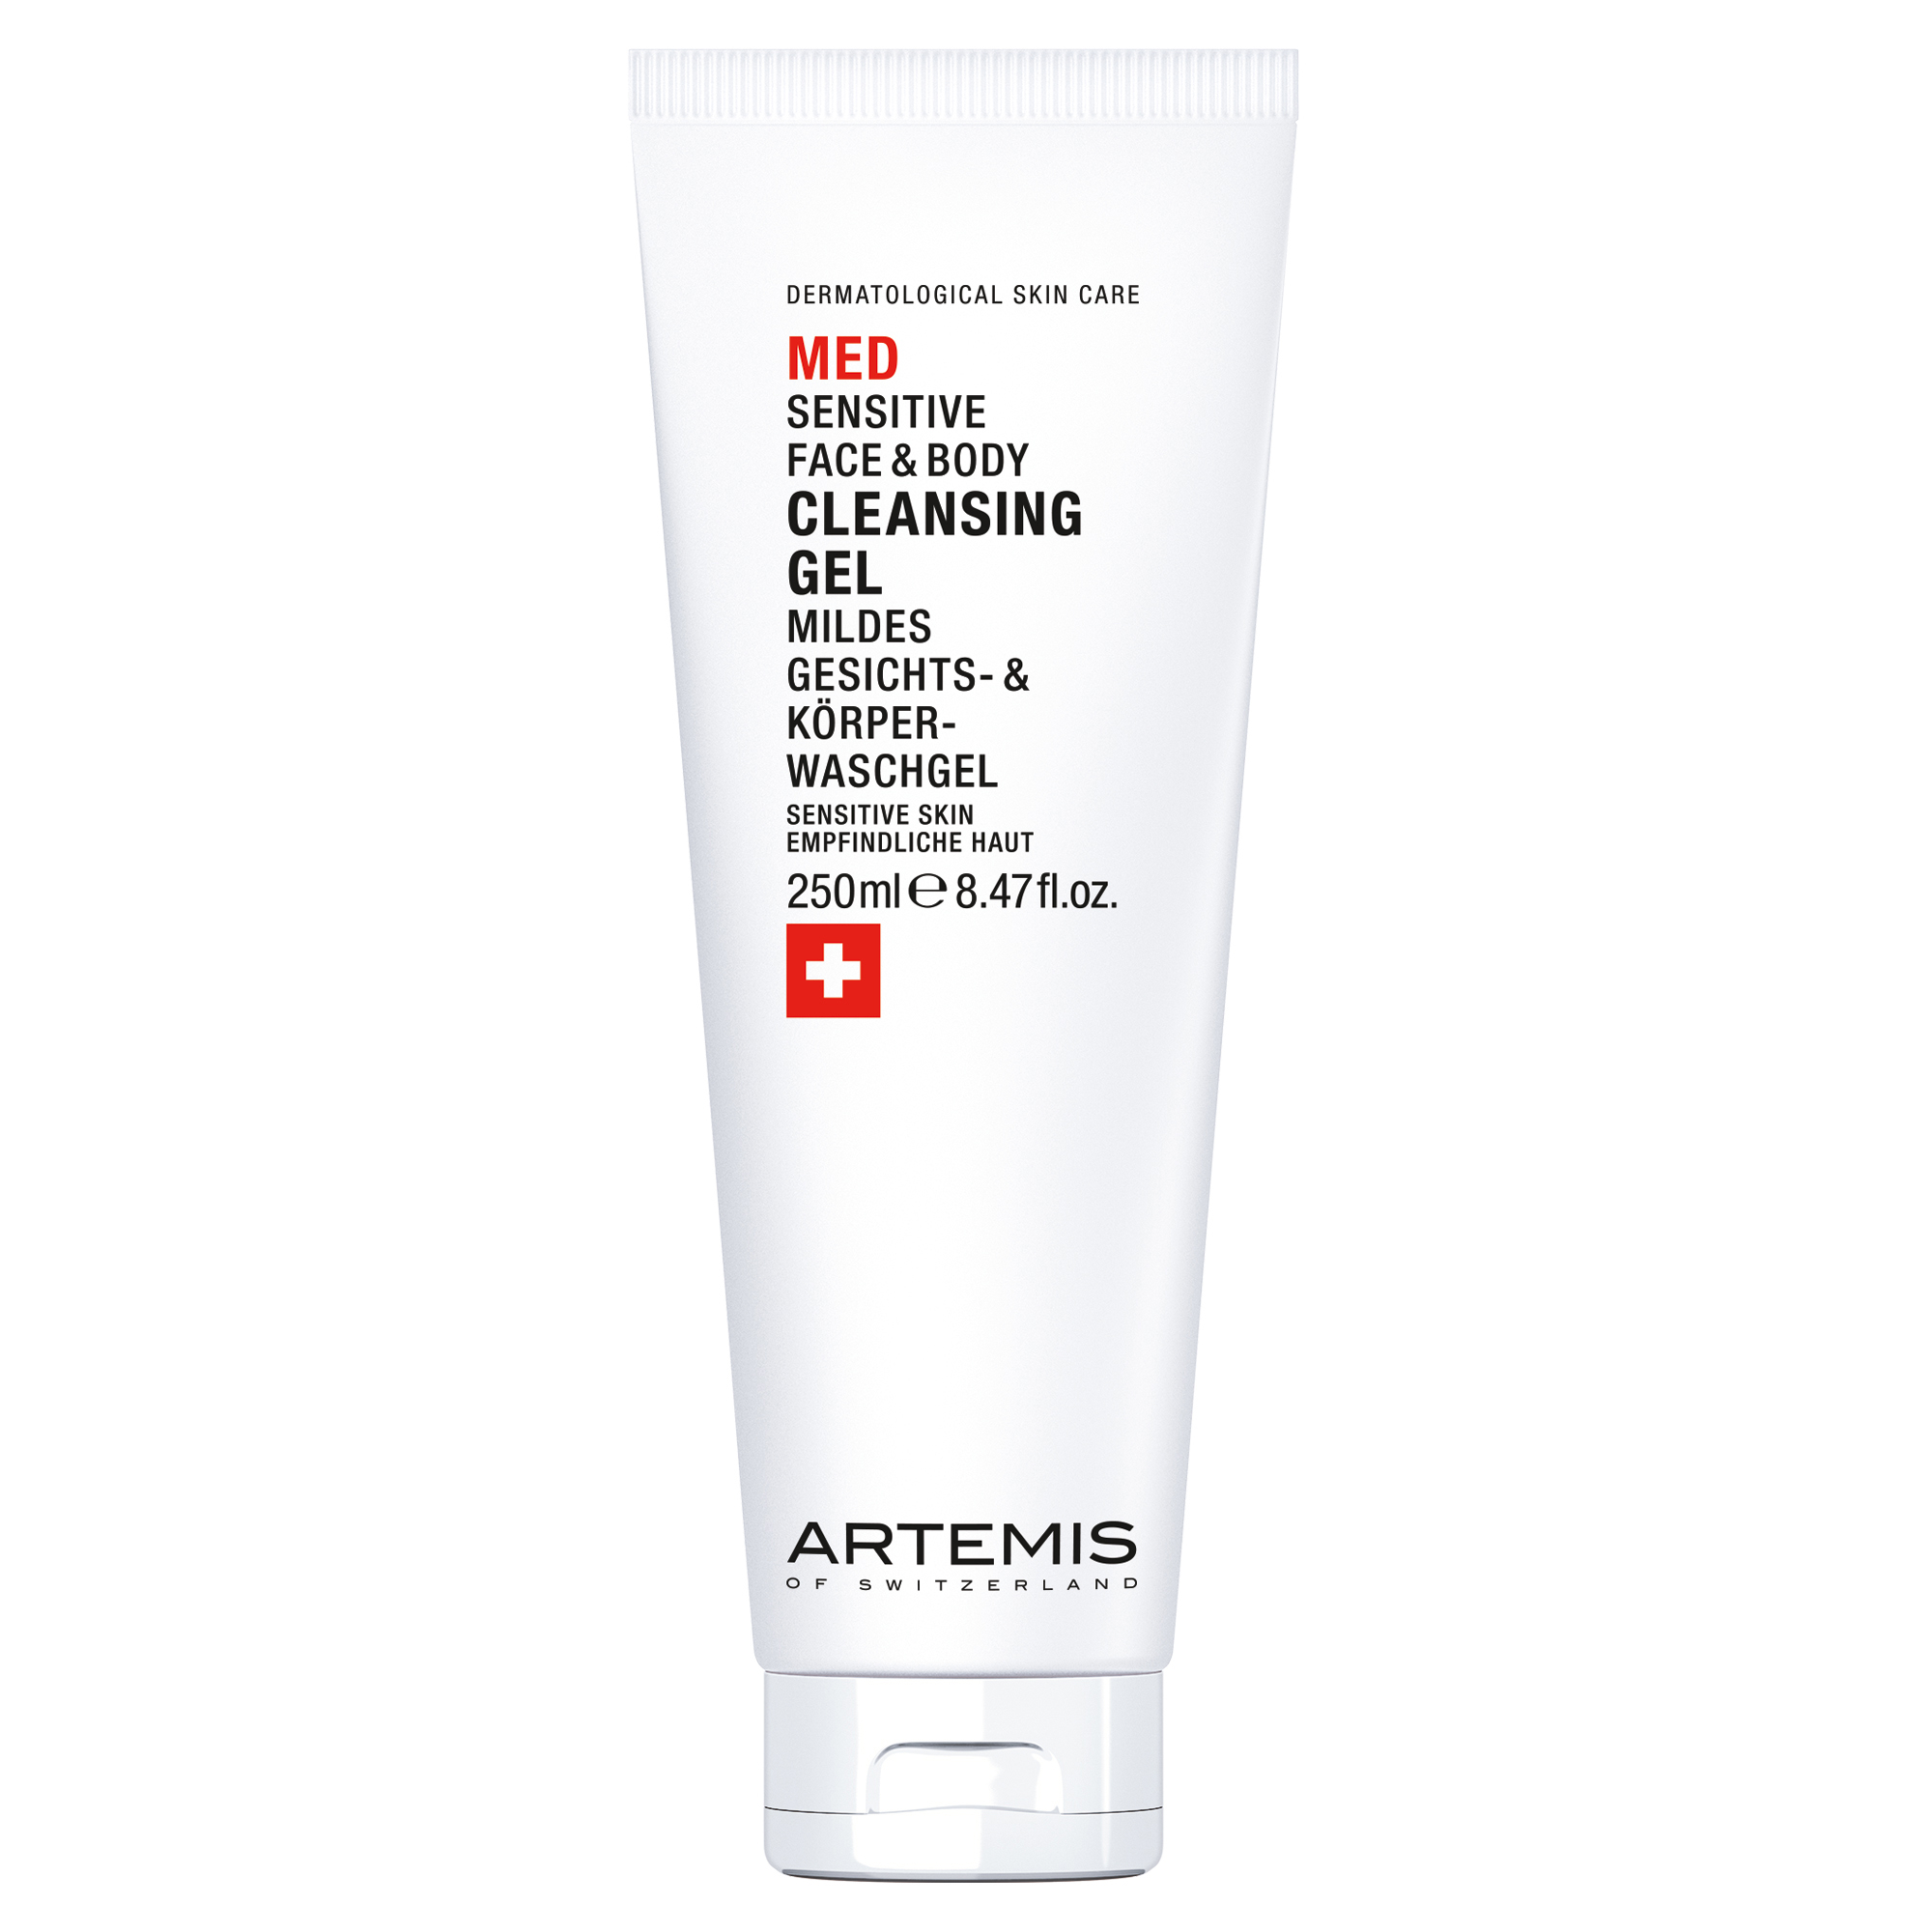 Artemis MED Face & Body Cleansing Gel 250ml